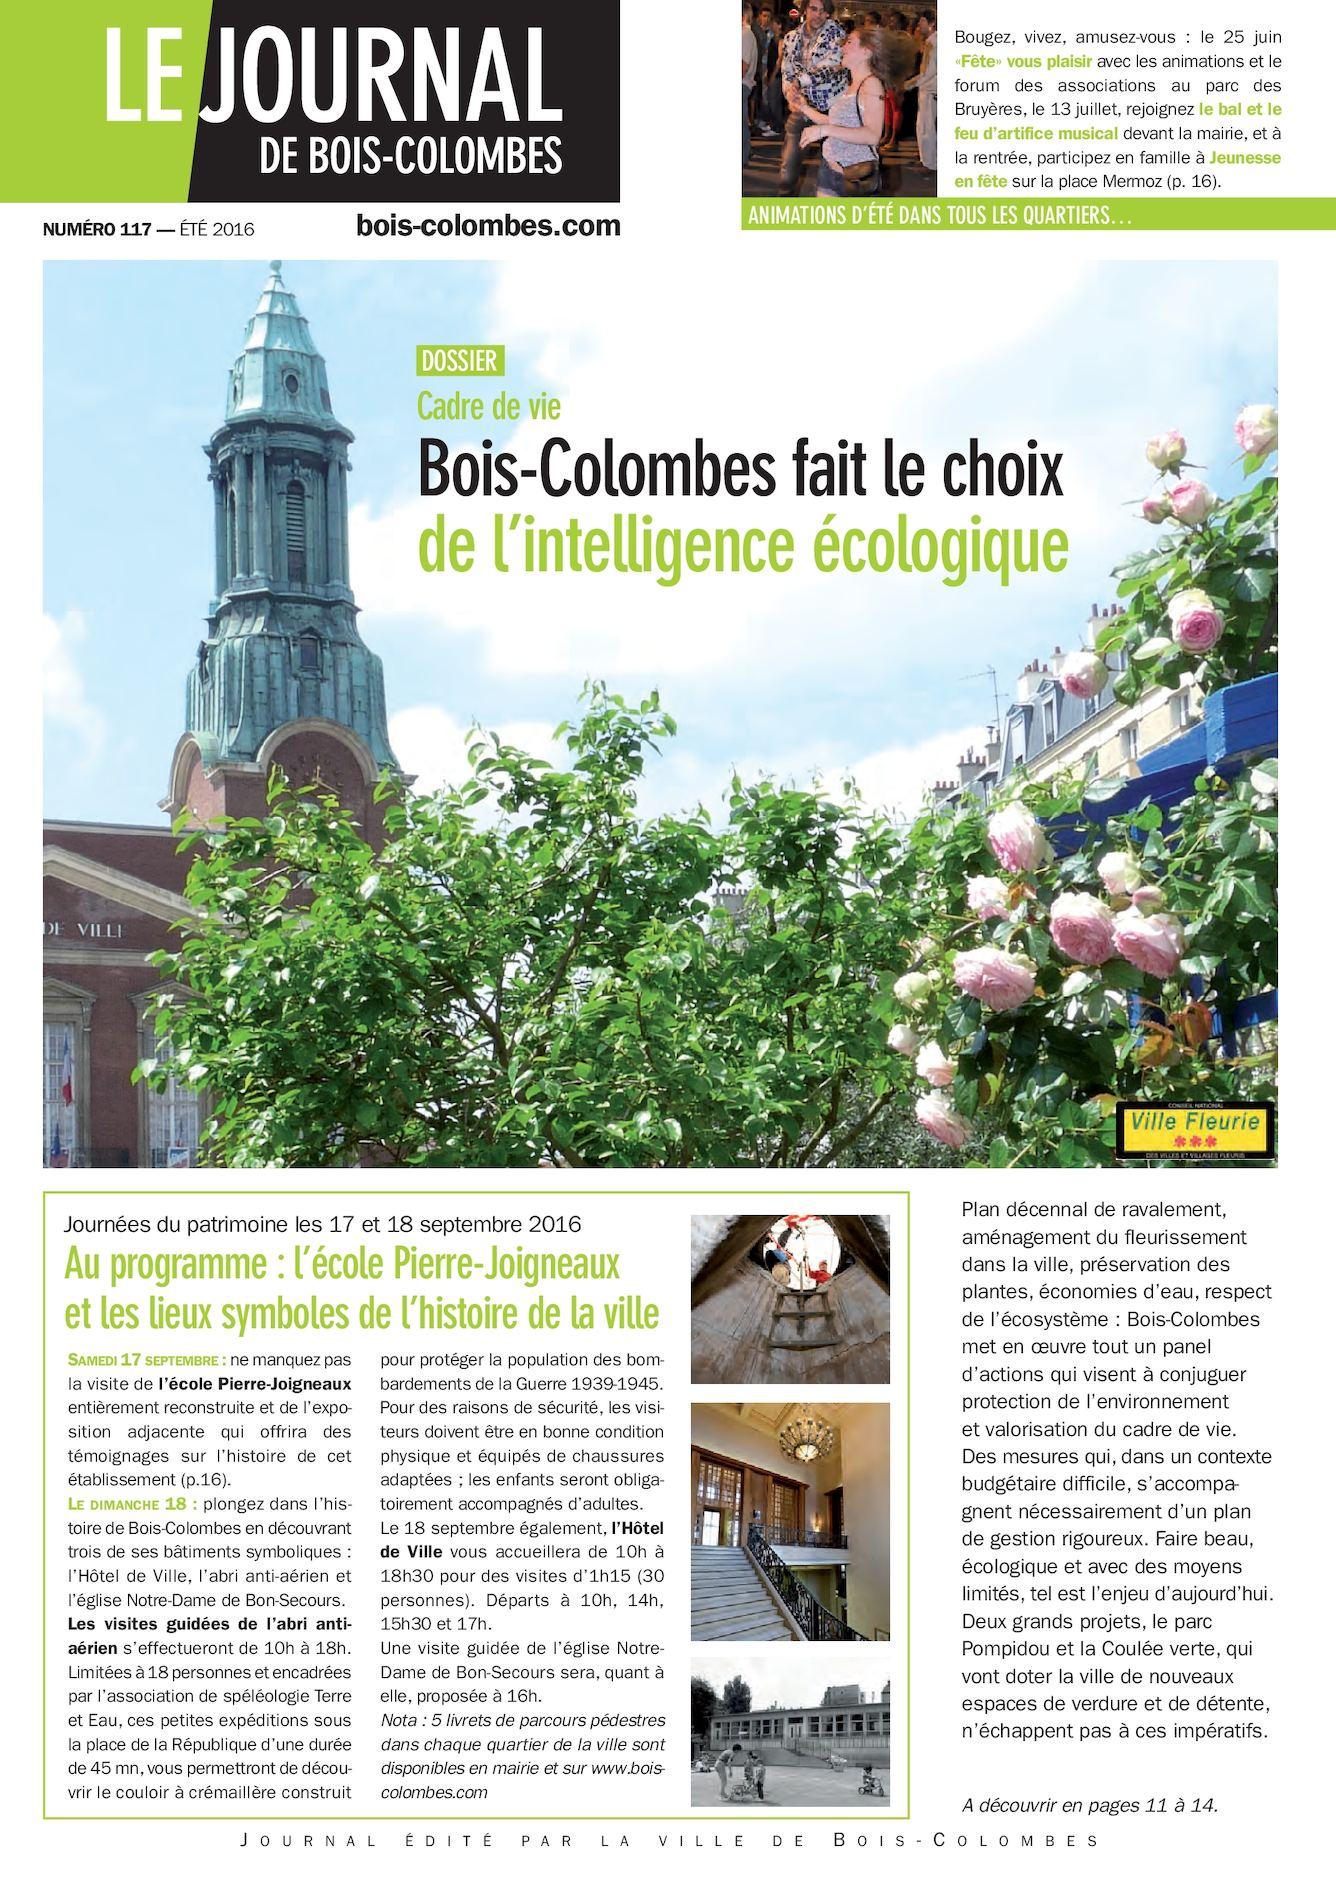 Calaméo Journal de Bois Colombes JBC n u00b0117ÉTÉ 2016 # Aviva Vie Bois Colombes